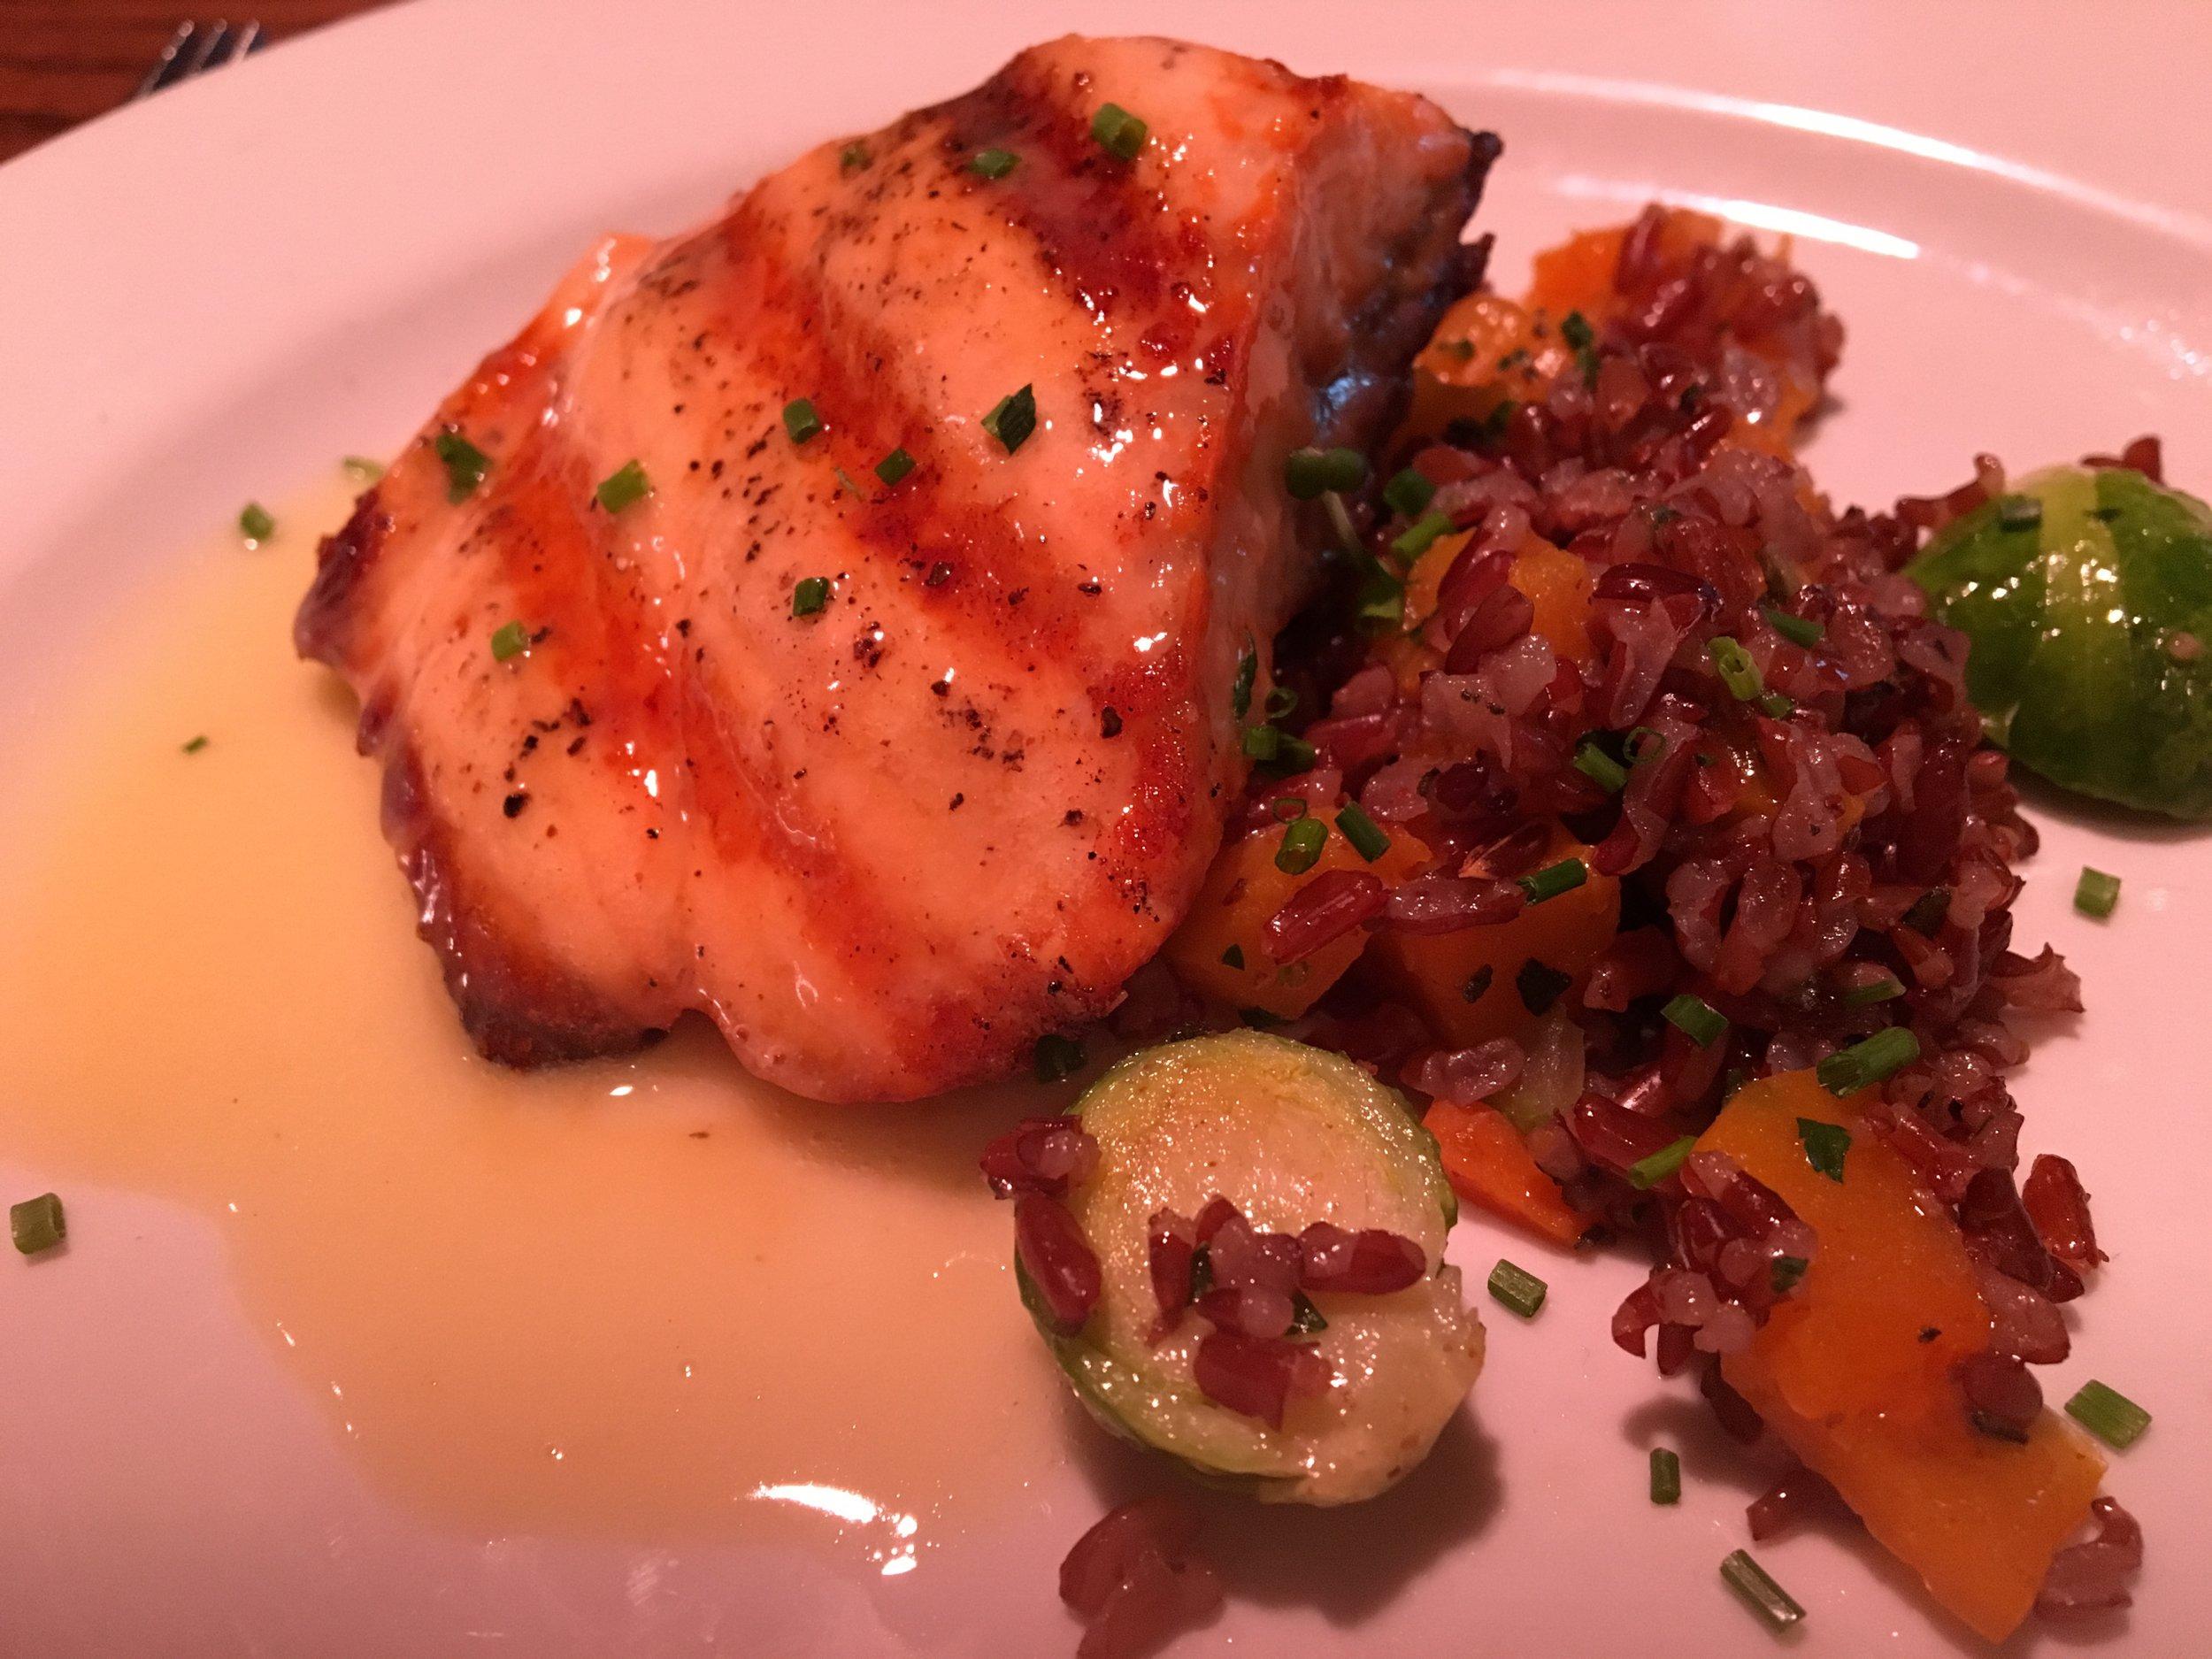 Kansas City Restaurant Week - Pierponts - Salmon